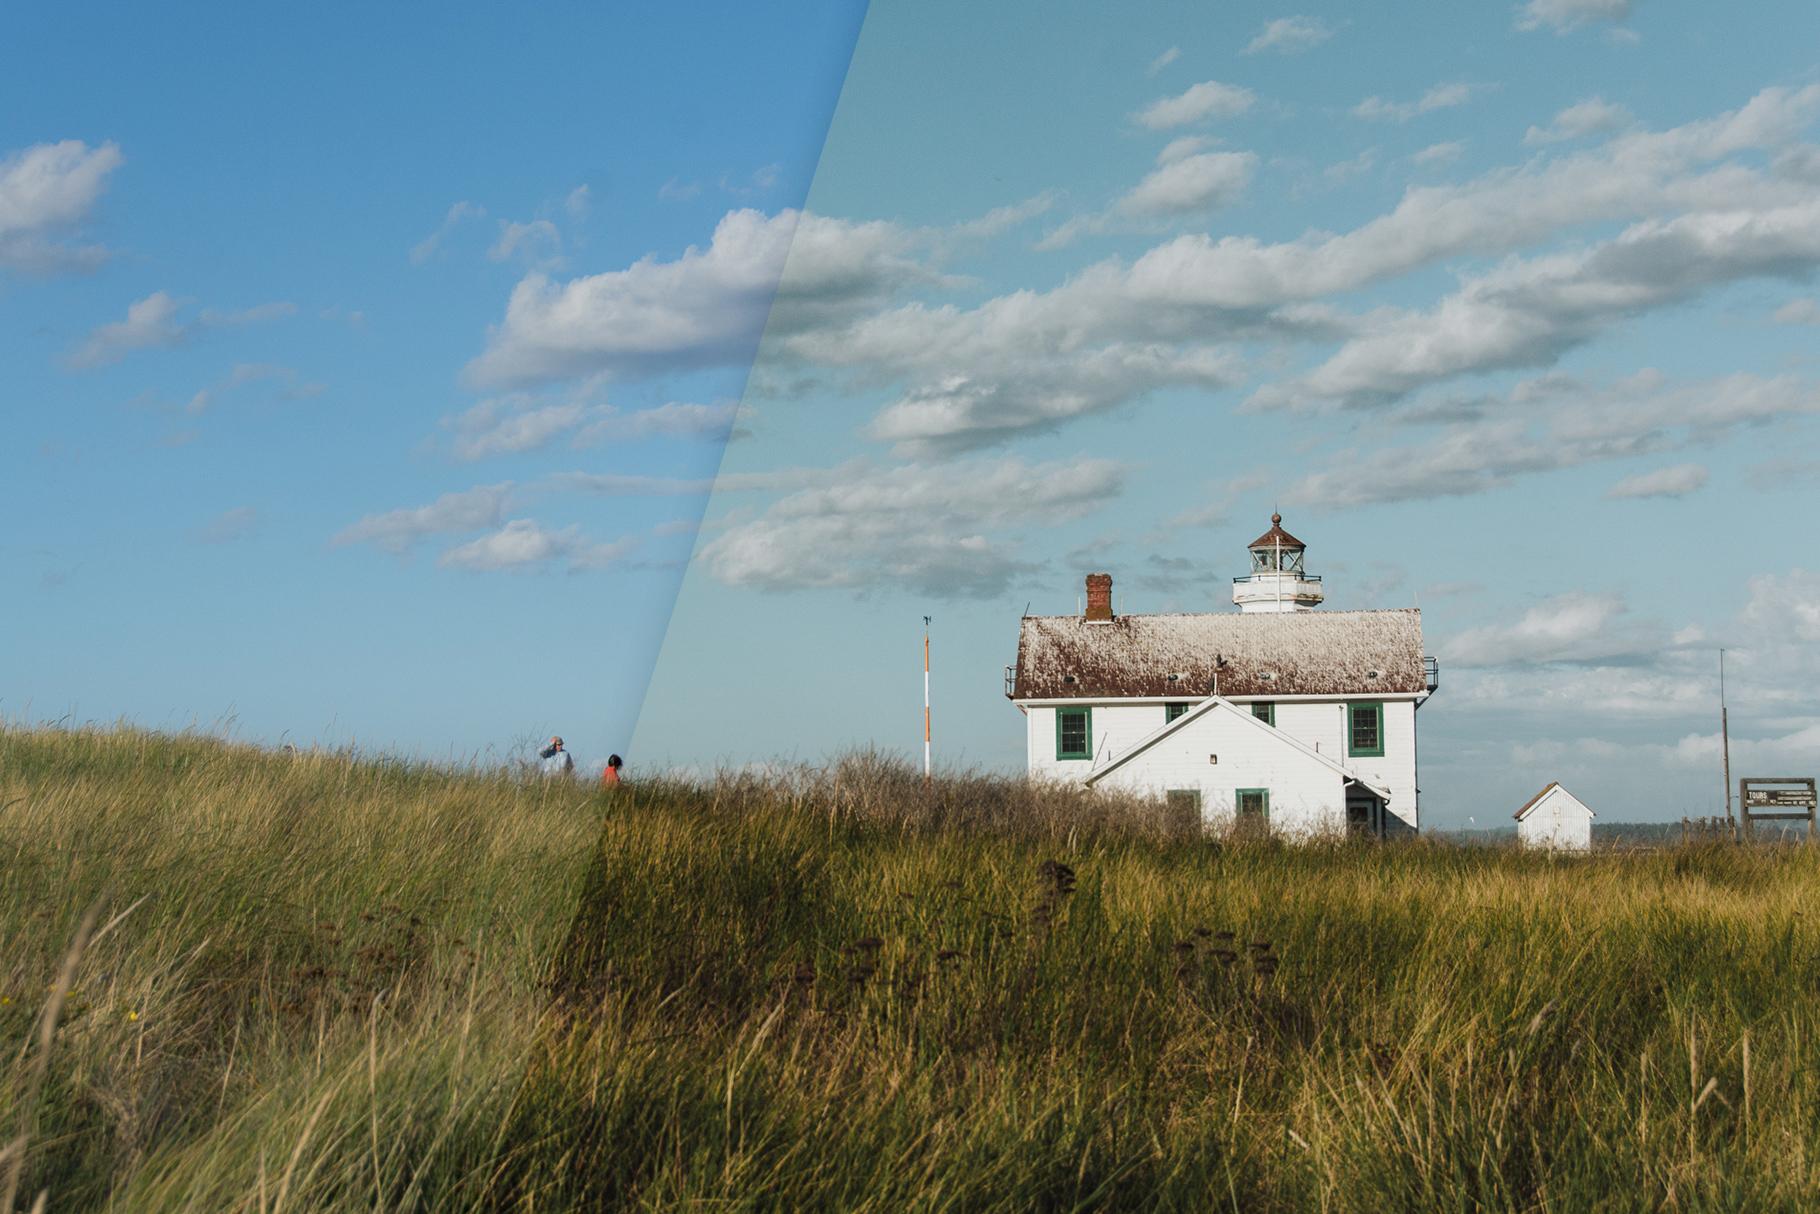 Best Lightroom Presets for Travel & Landscape Photography example image 10